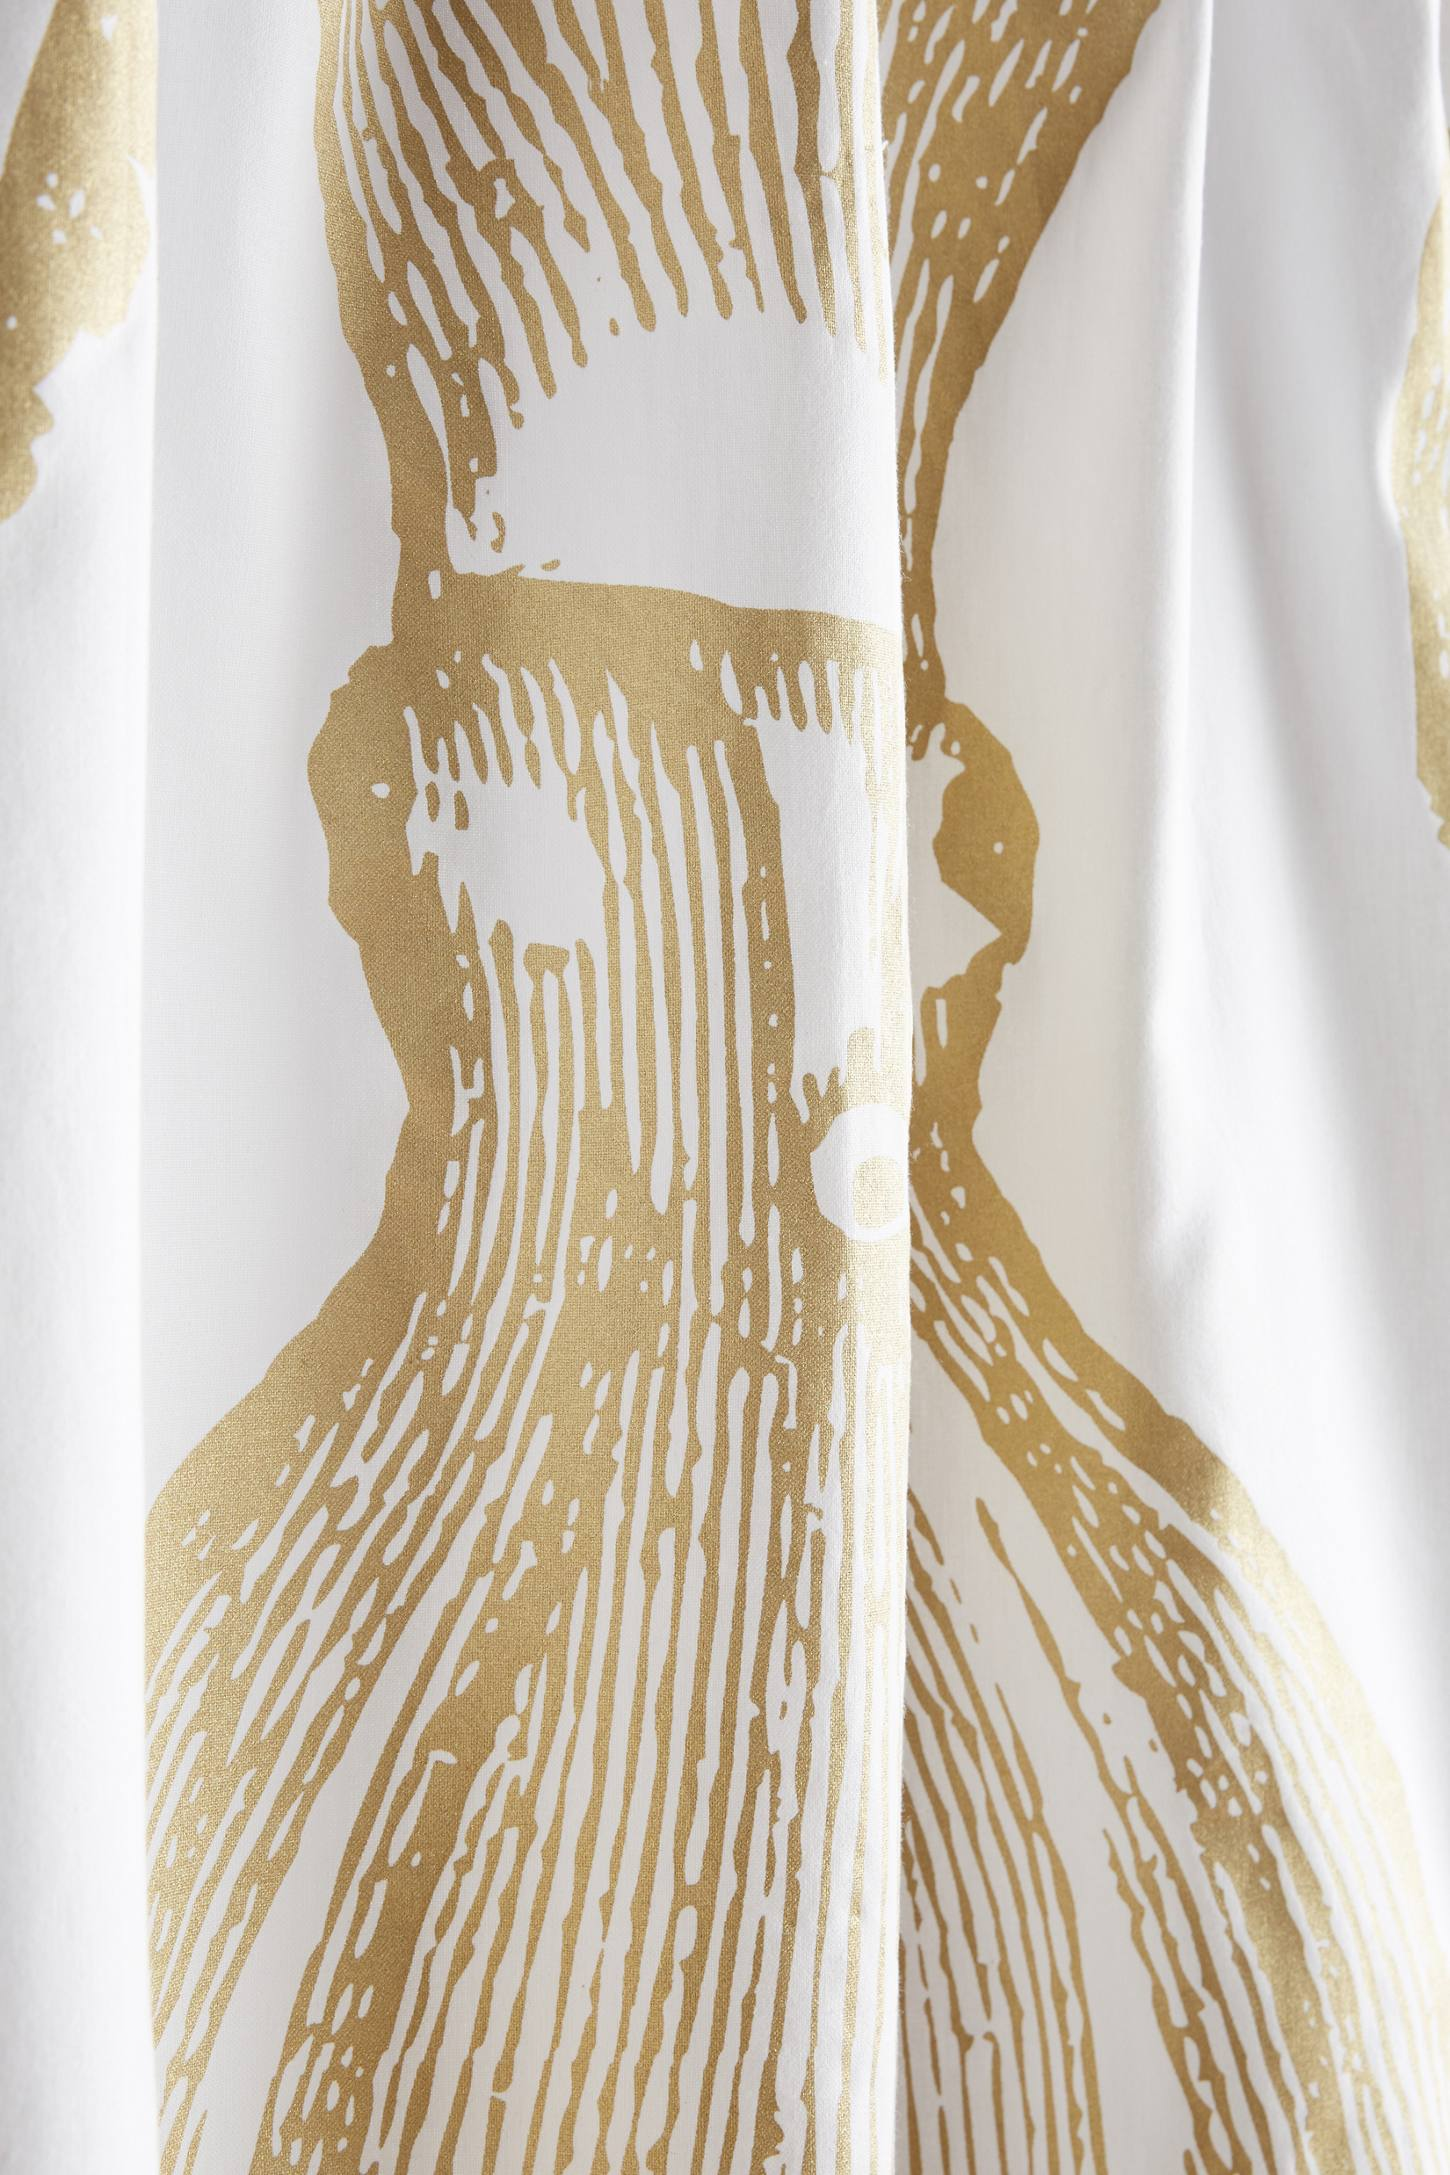 Thomas Paul Octopus Shower Curtain Canada Curtain Menzilperde Net